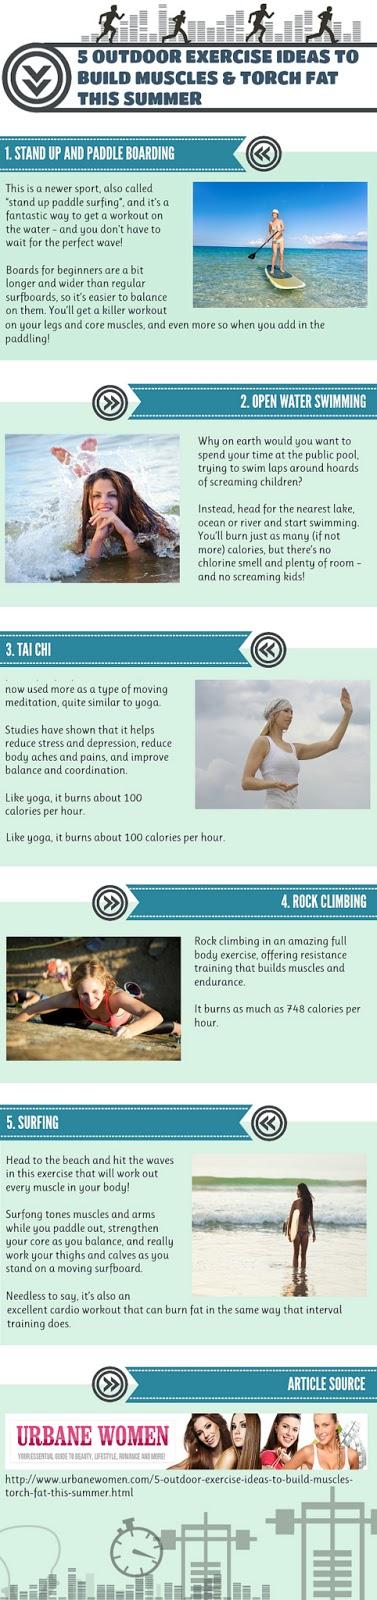 Health & nutrition tips: 5 Outdoor Exercise Ideas